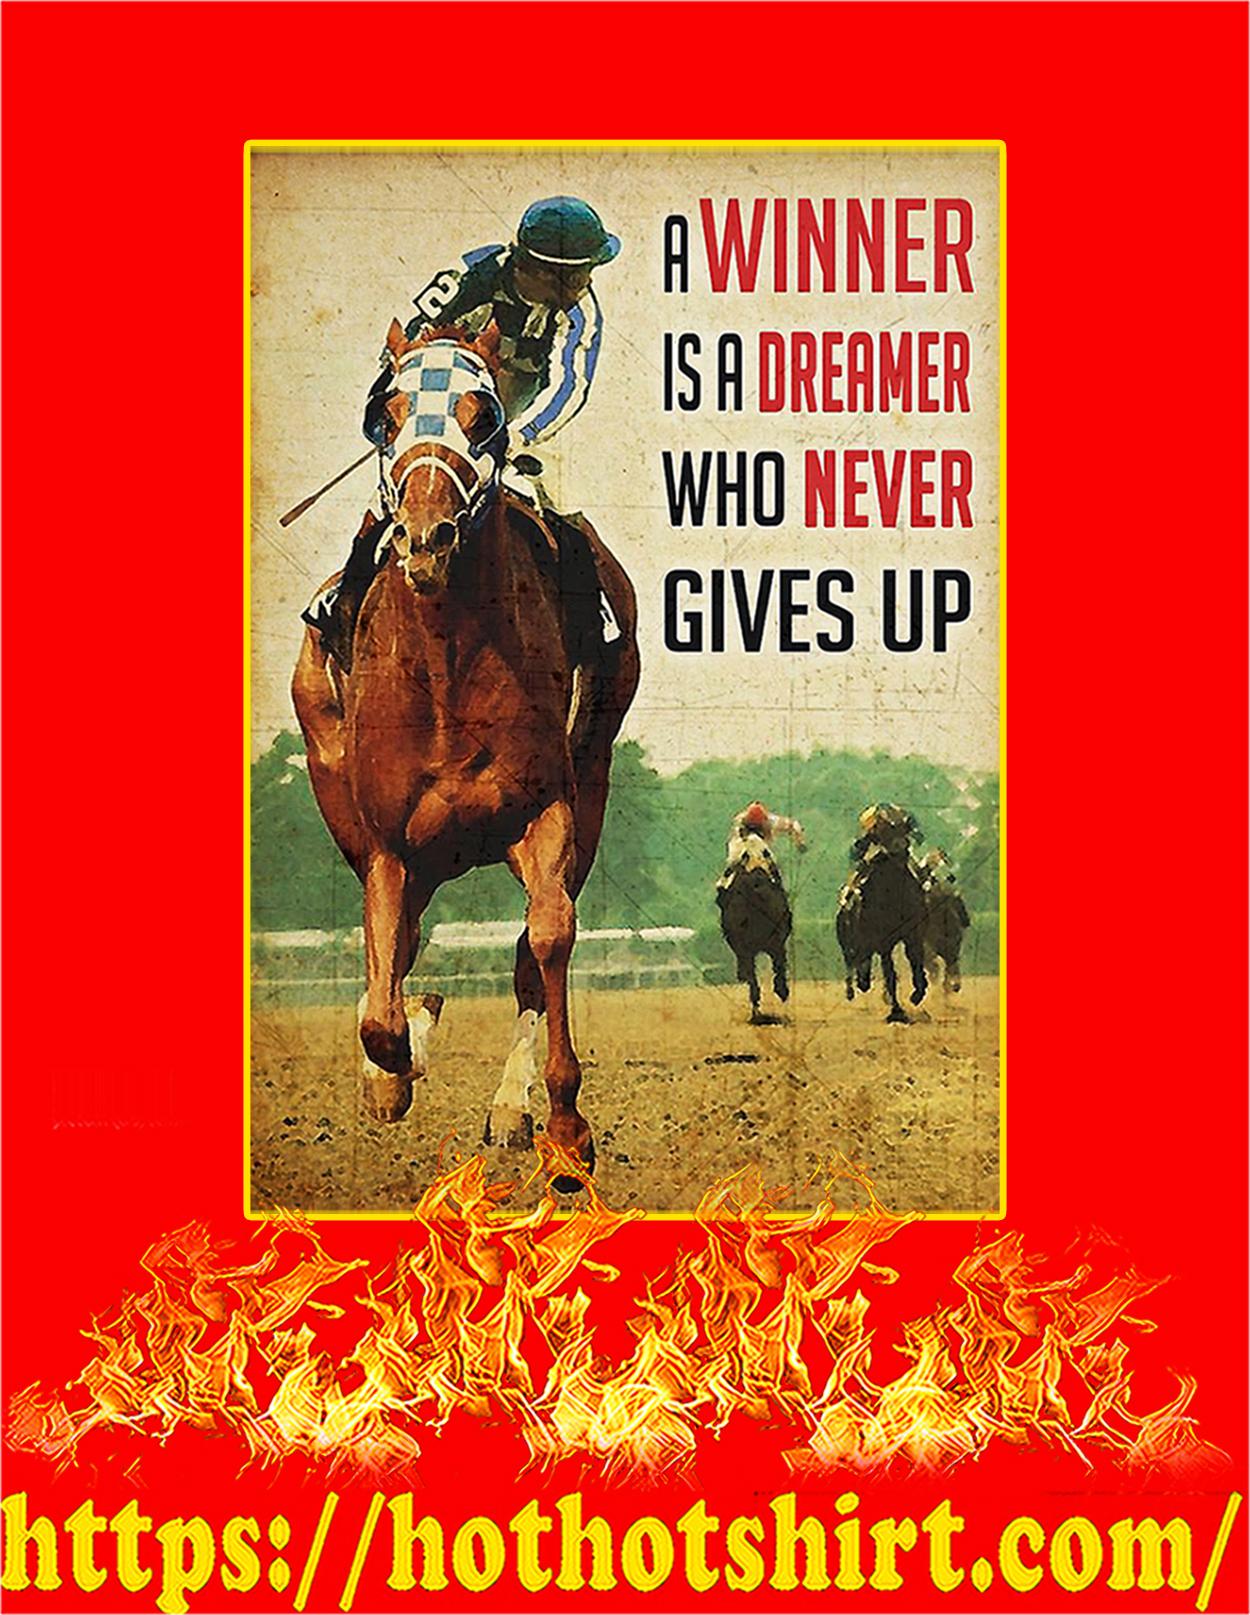 Horse racing A winner is a dreamer poster - A3